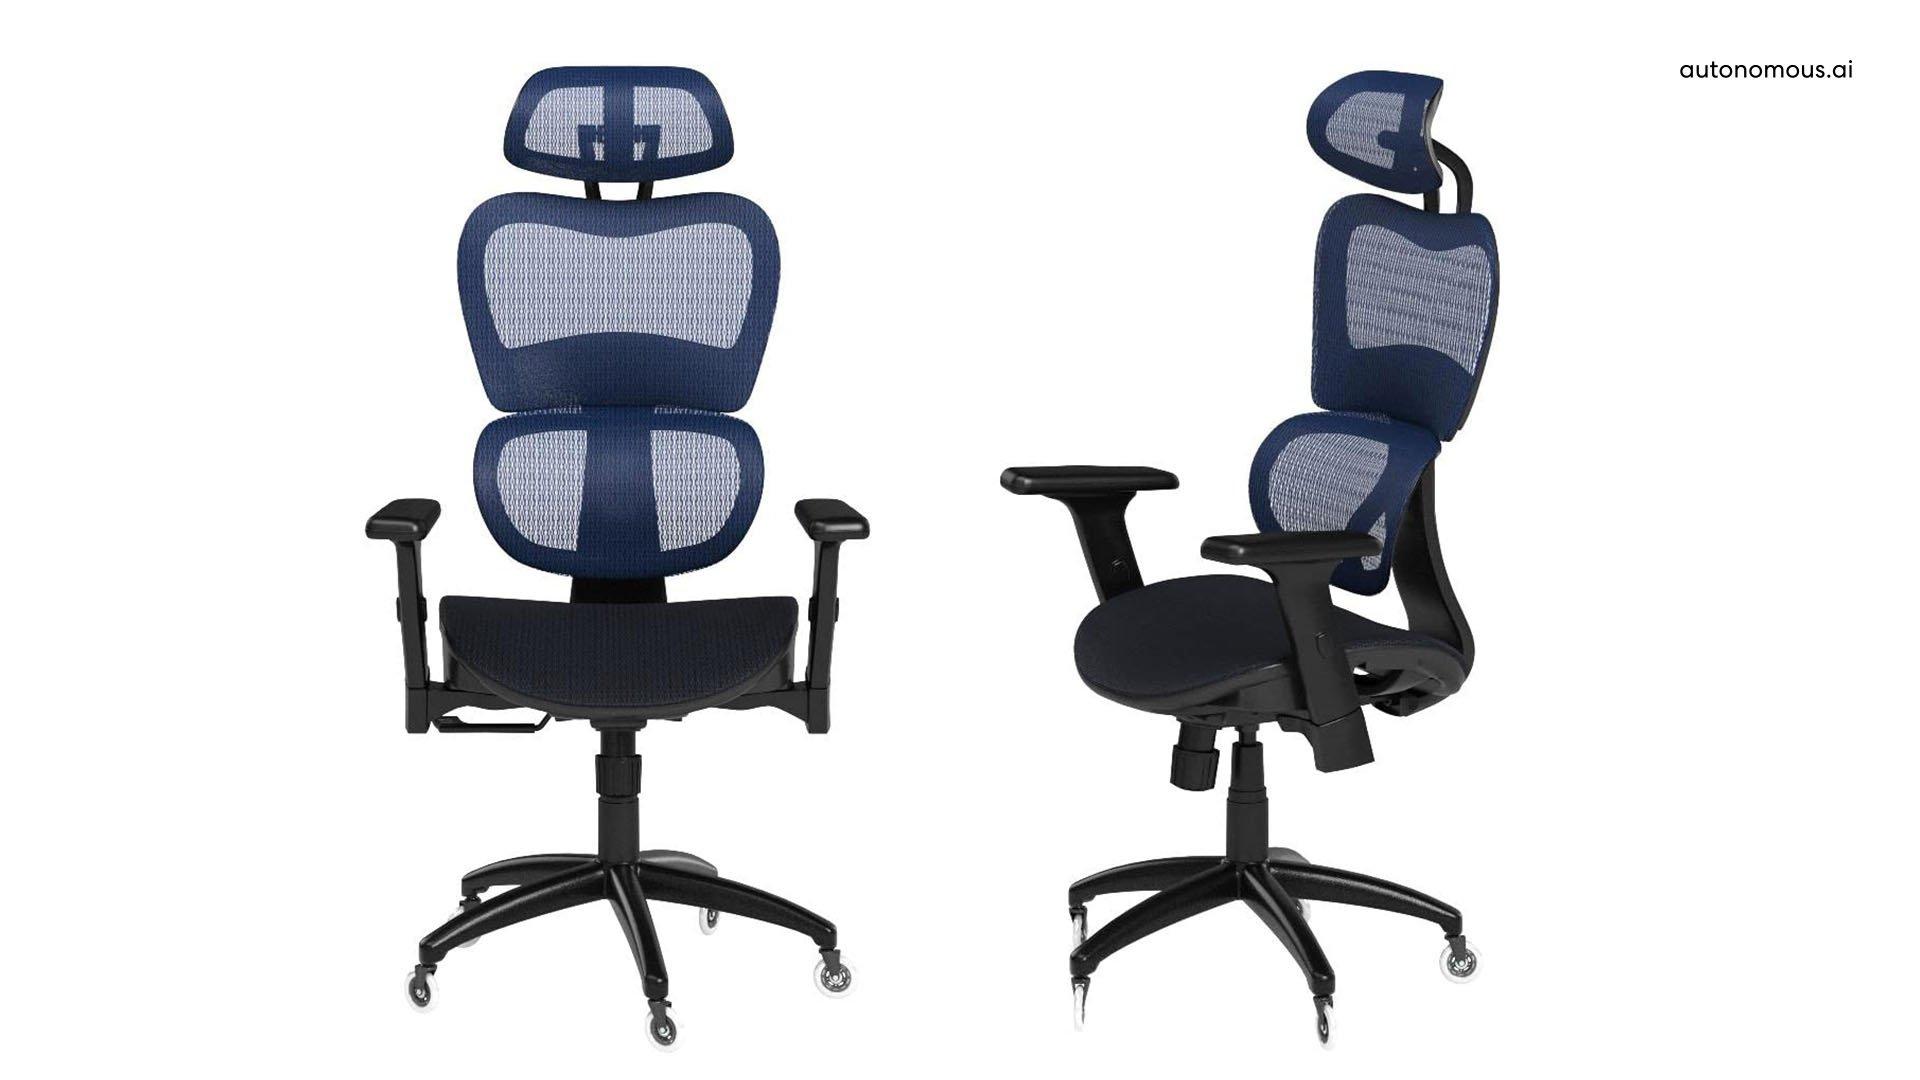 NOUHAUS Ergo3D Ergonomic Chair